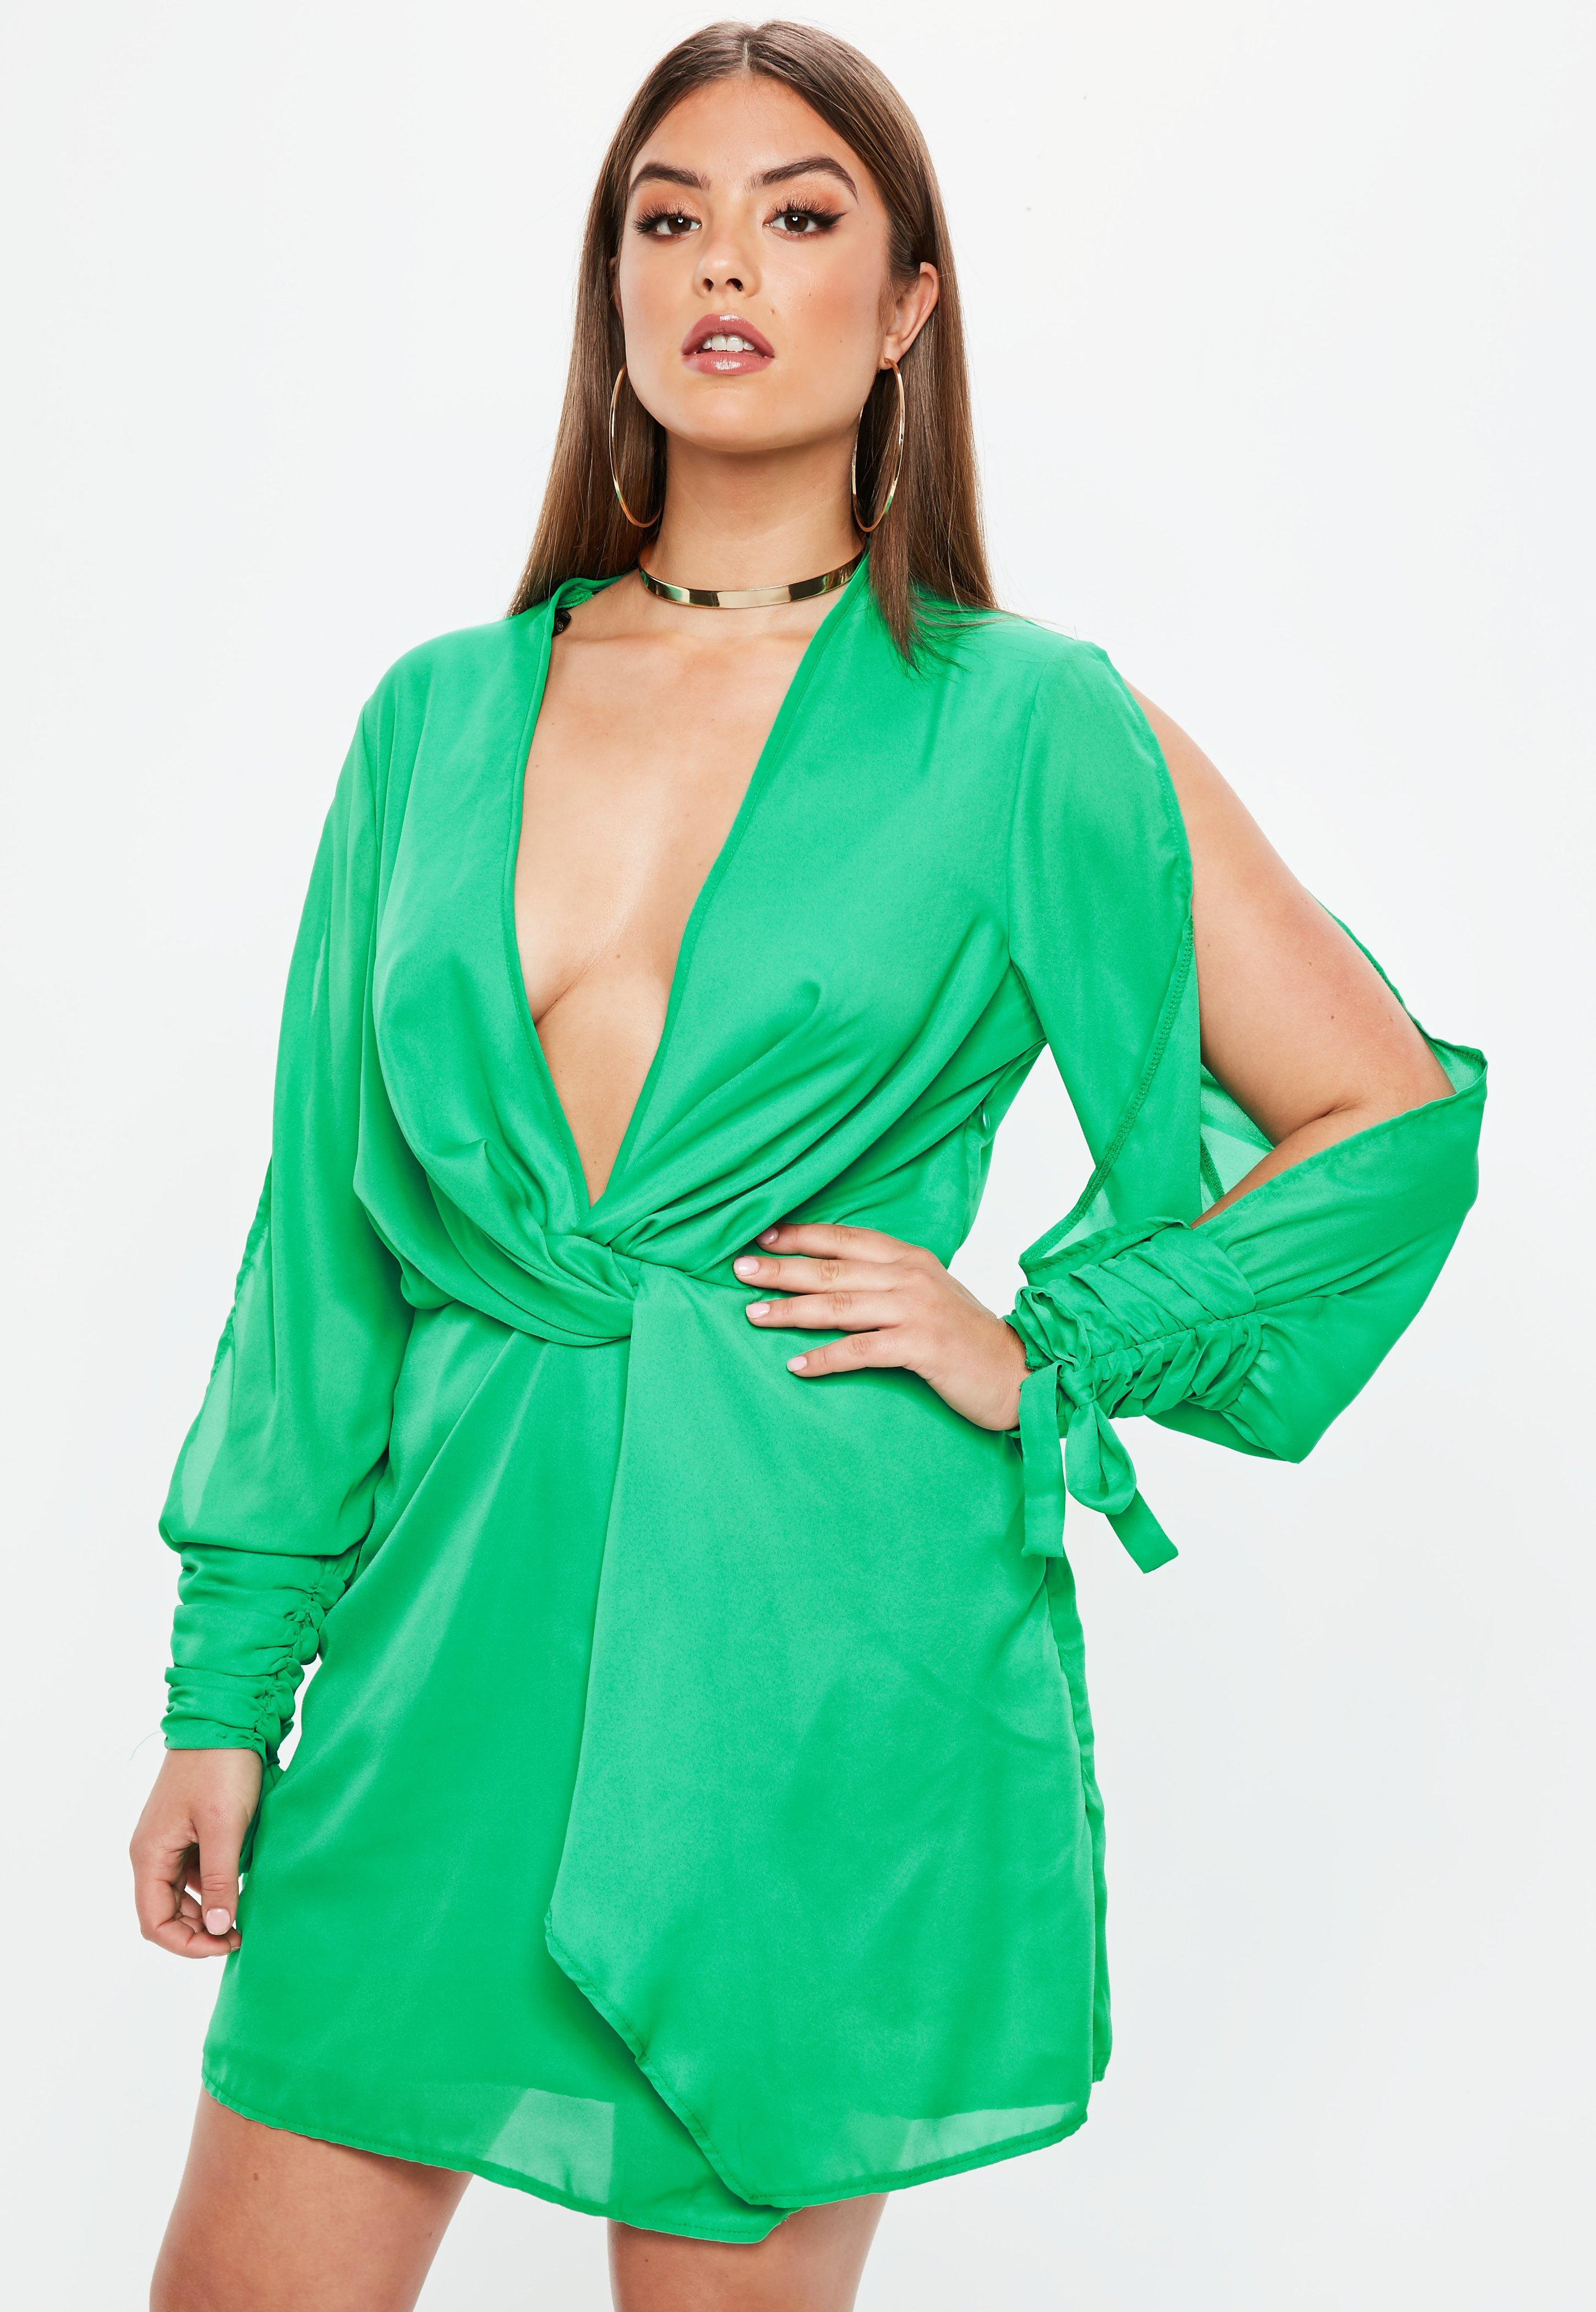 Satin Dress - Shop Silky Dresses Online | Missguided